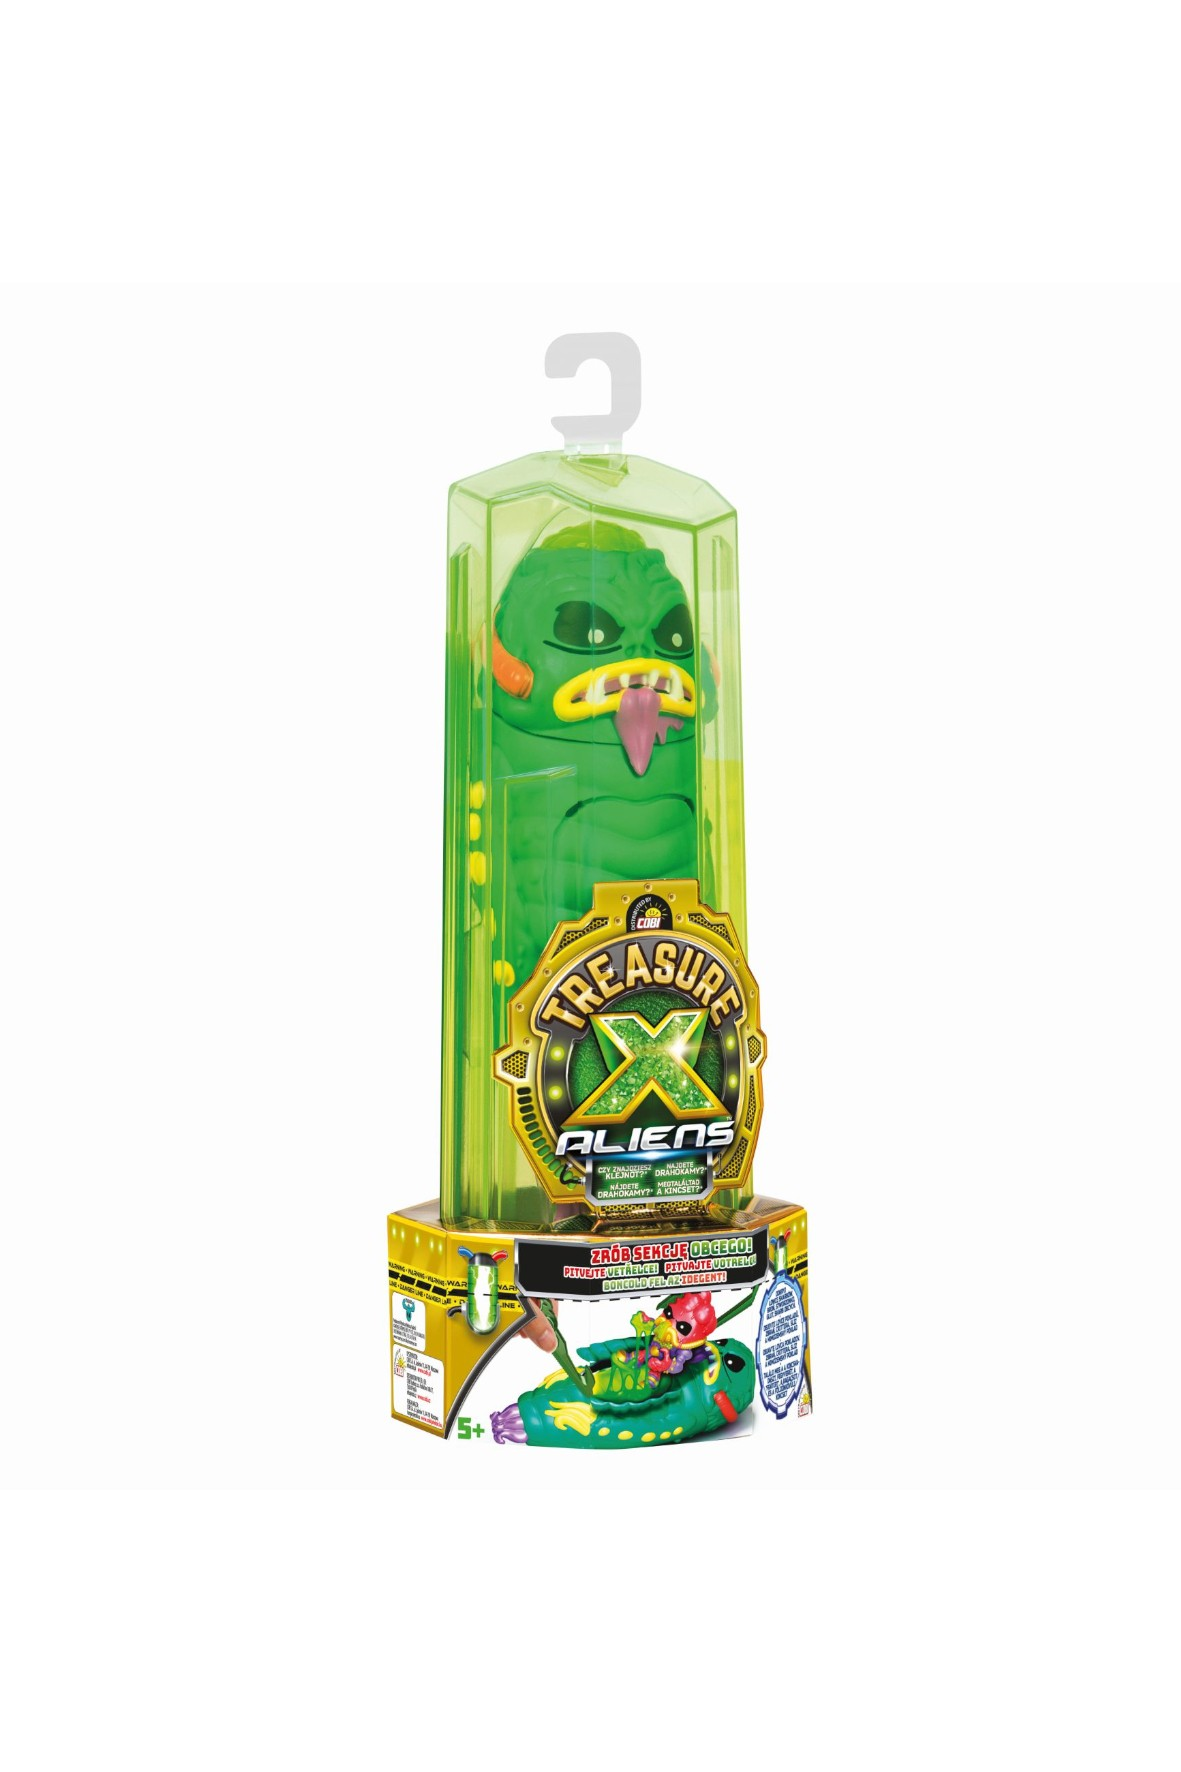 Treasure X Aliens - obcy, zielony